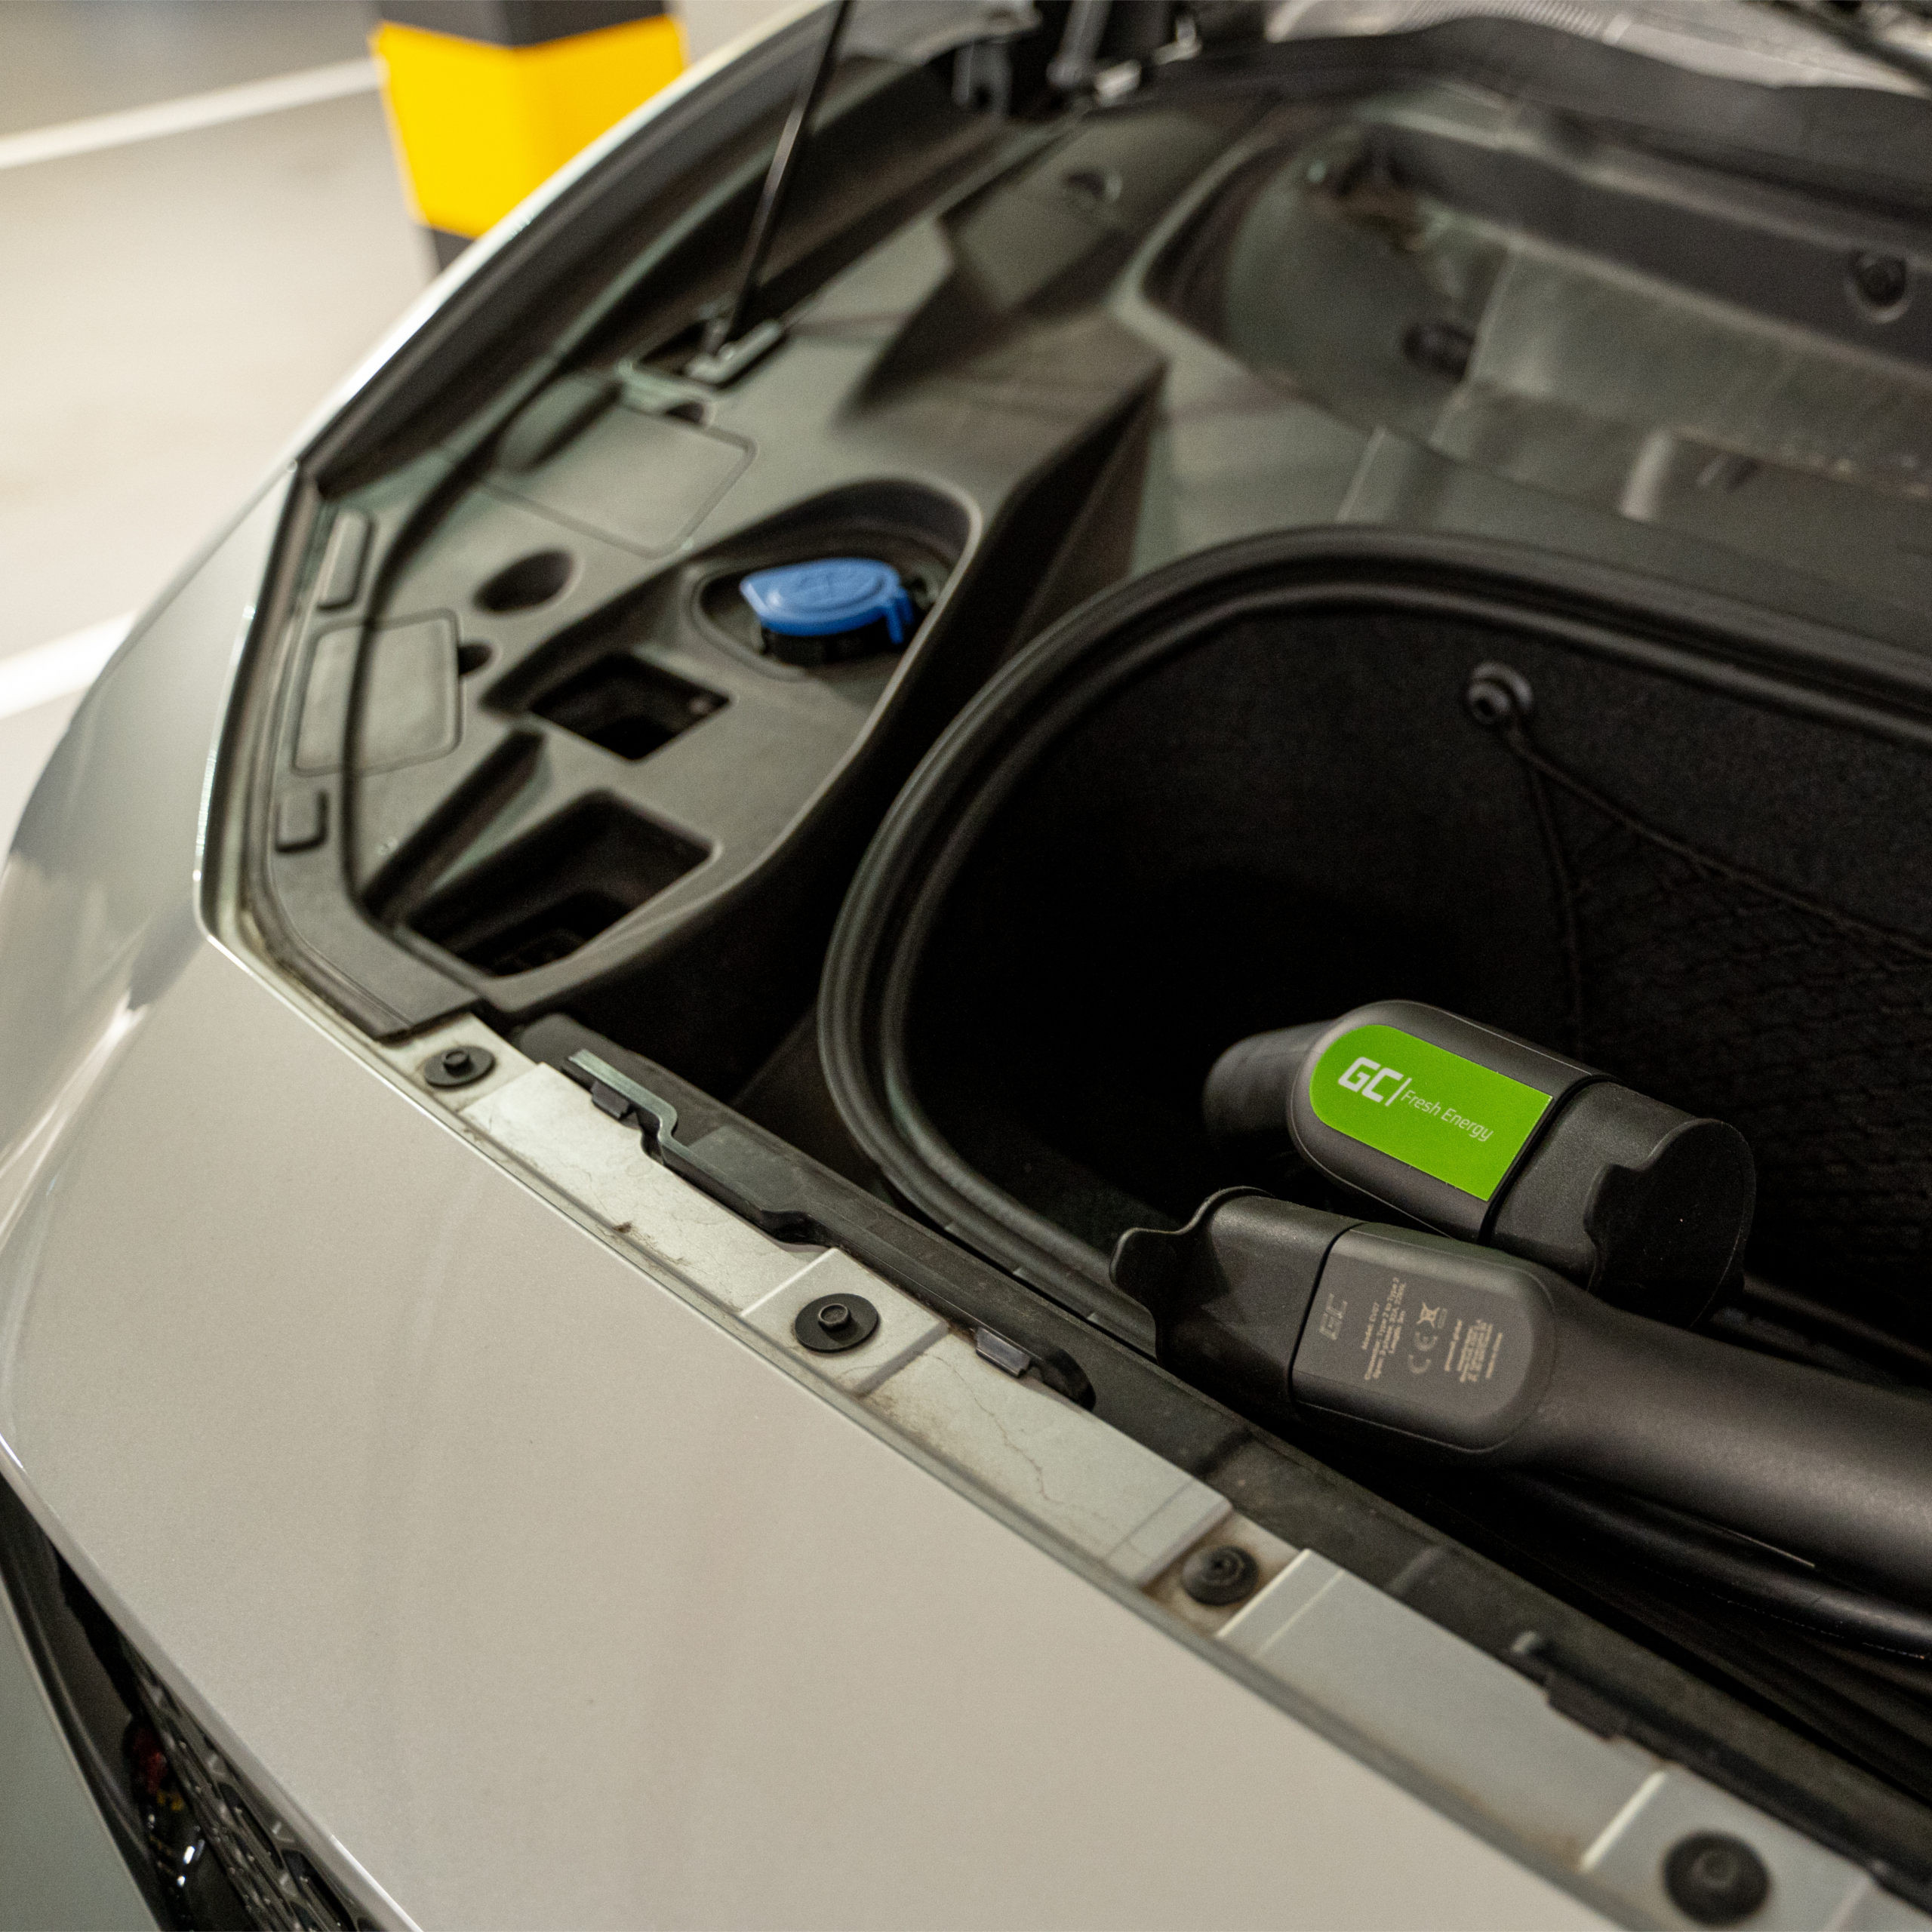 Kabel Green Cell GC EV Type 2 22kW 5 m pro nabíjení Tesla Model 3 / S / X, Leaf, ZOE, i3, ID.3, I-Pace, E-Tron, Taycan